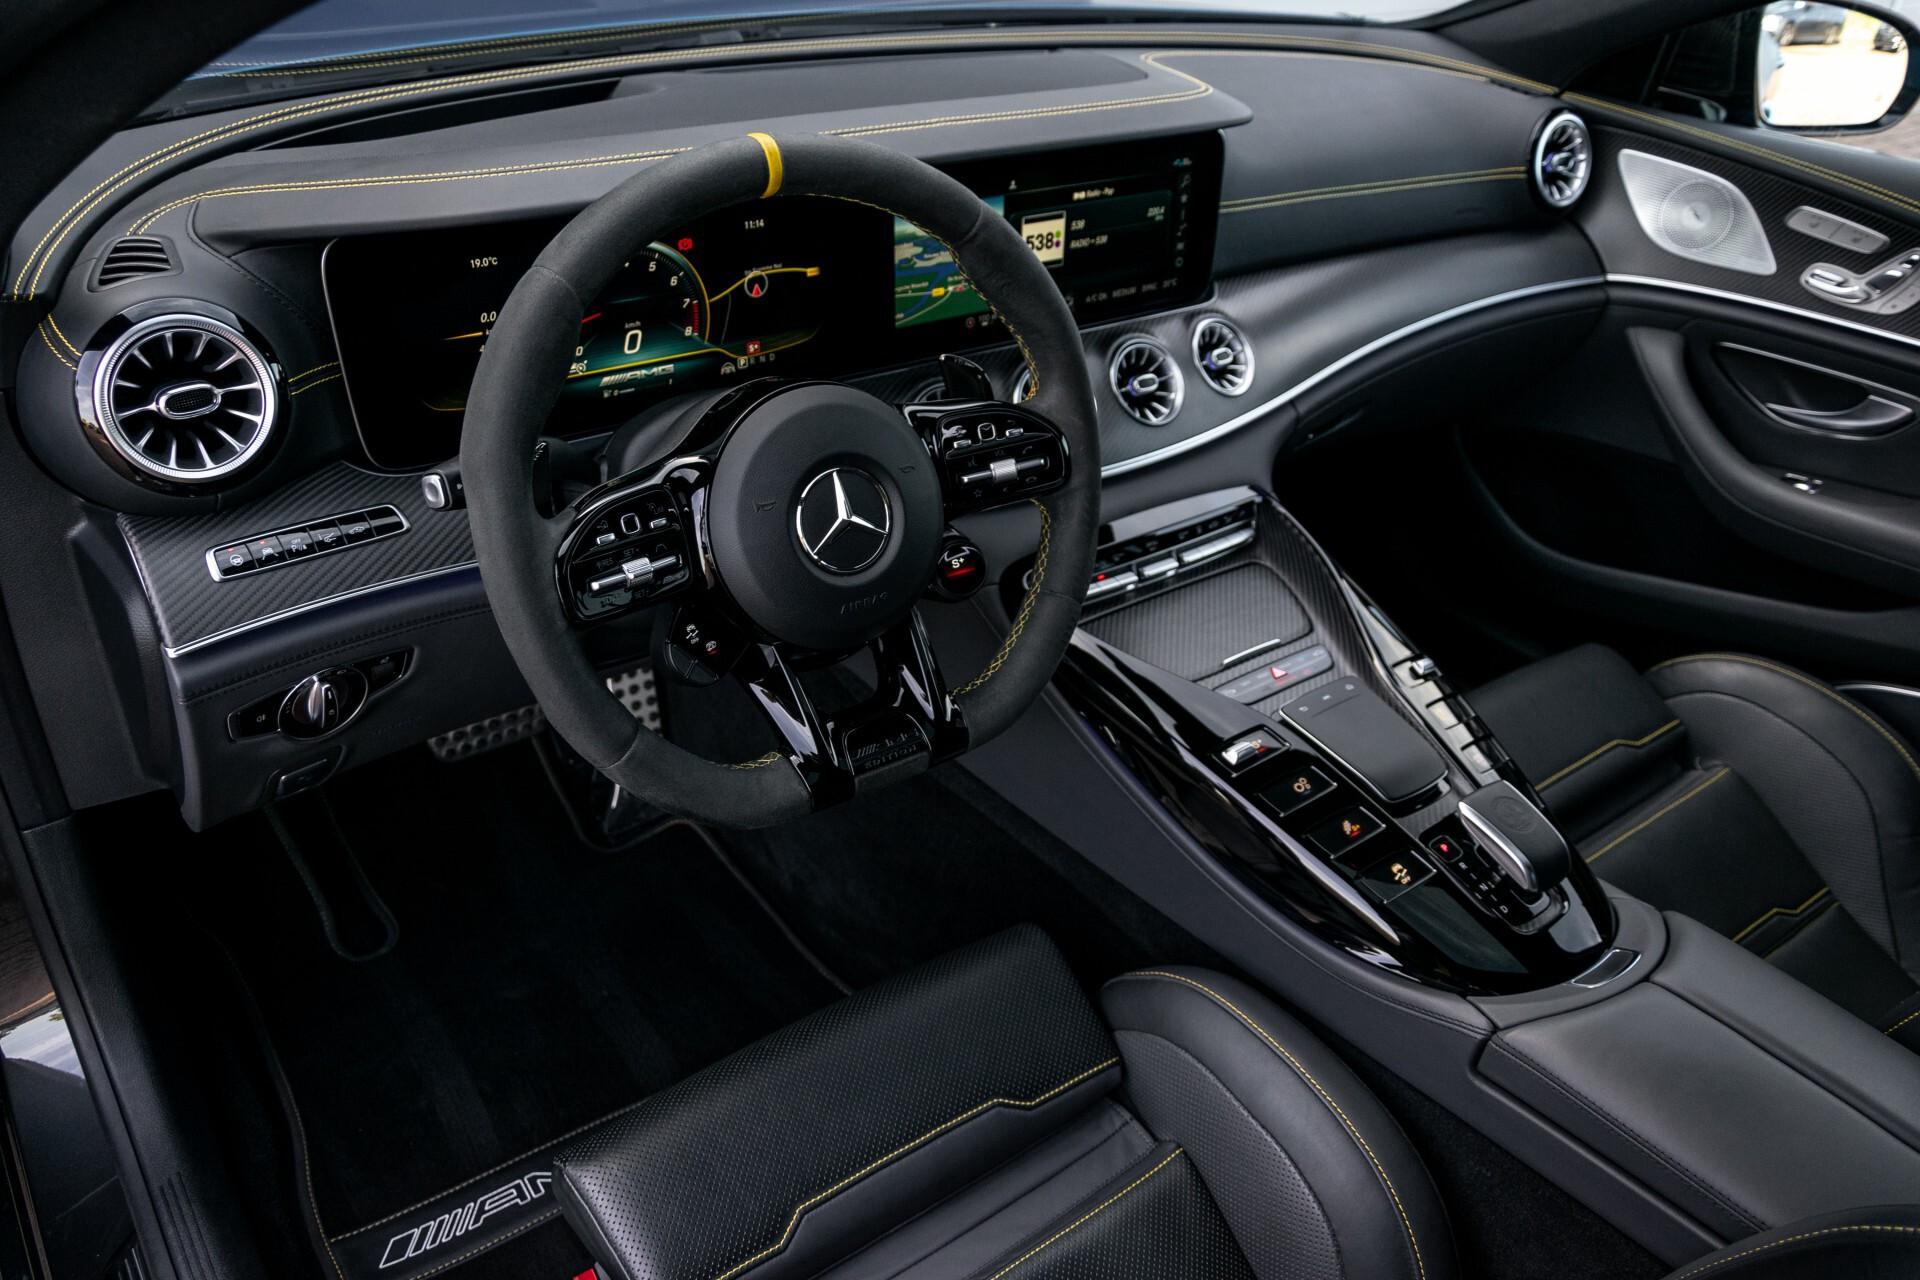 Mercedes-Benz AMG GT 4-Door Coupe 63 S 4MATIC+ Edition 1 Keramisch/Carbon/First Class/Dynamic Plus/Burmester High End 3D Aut9 Foto 46